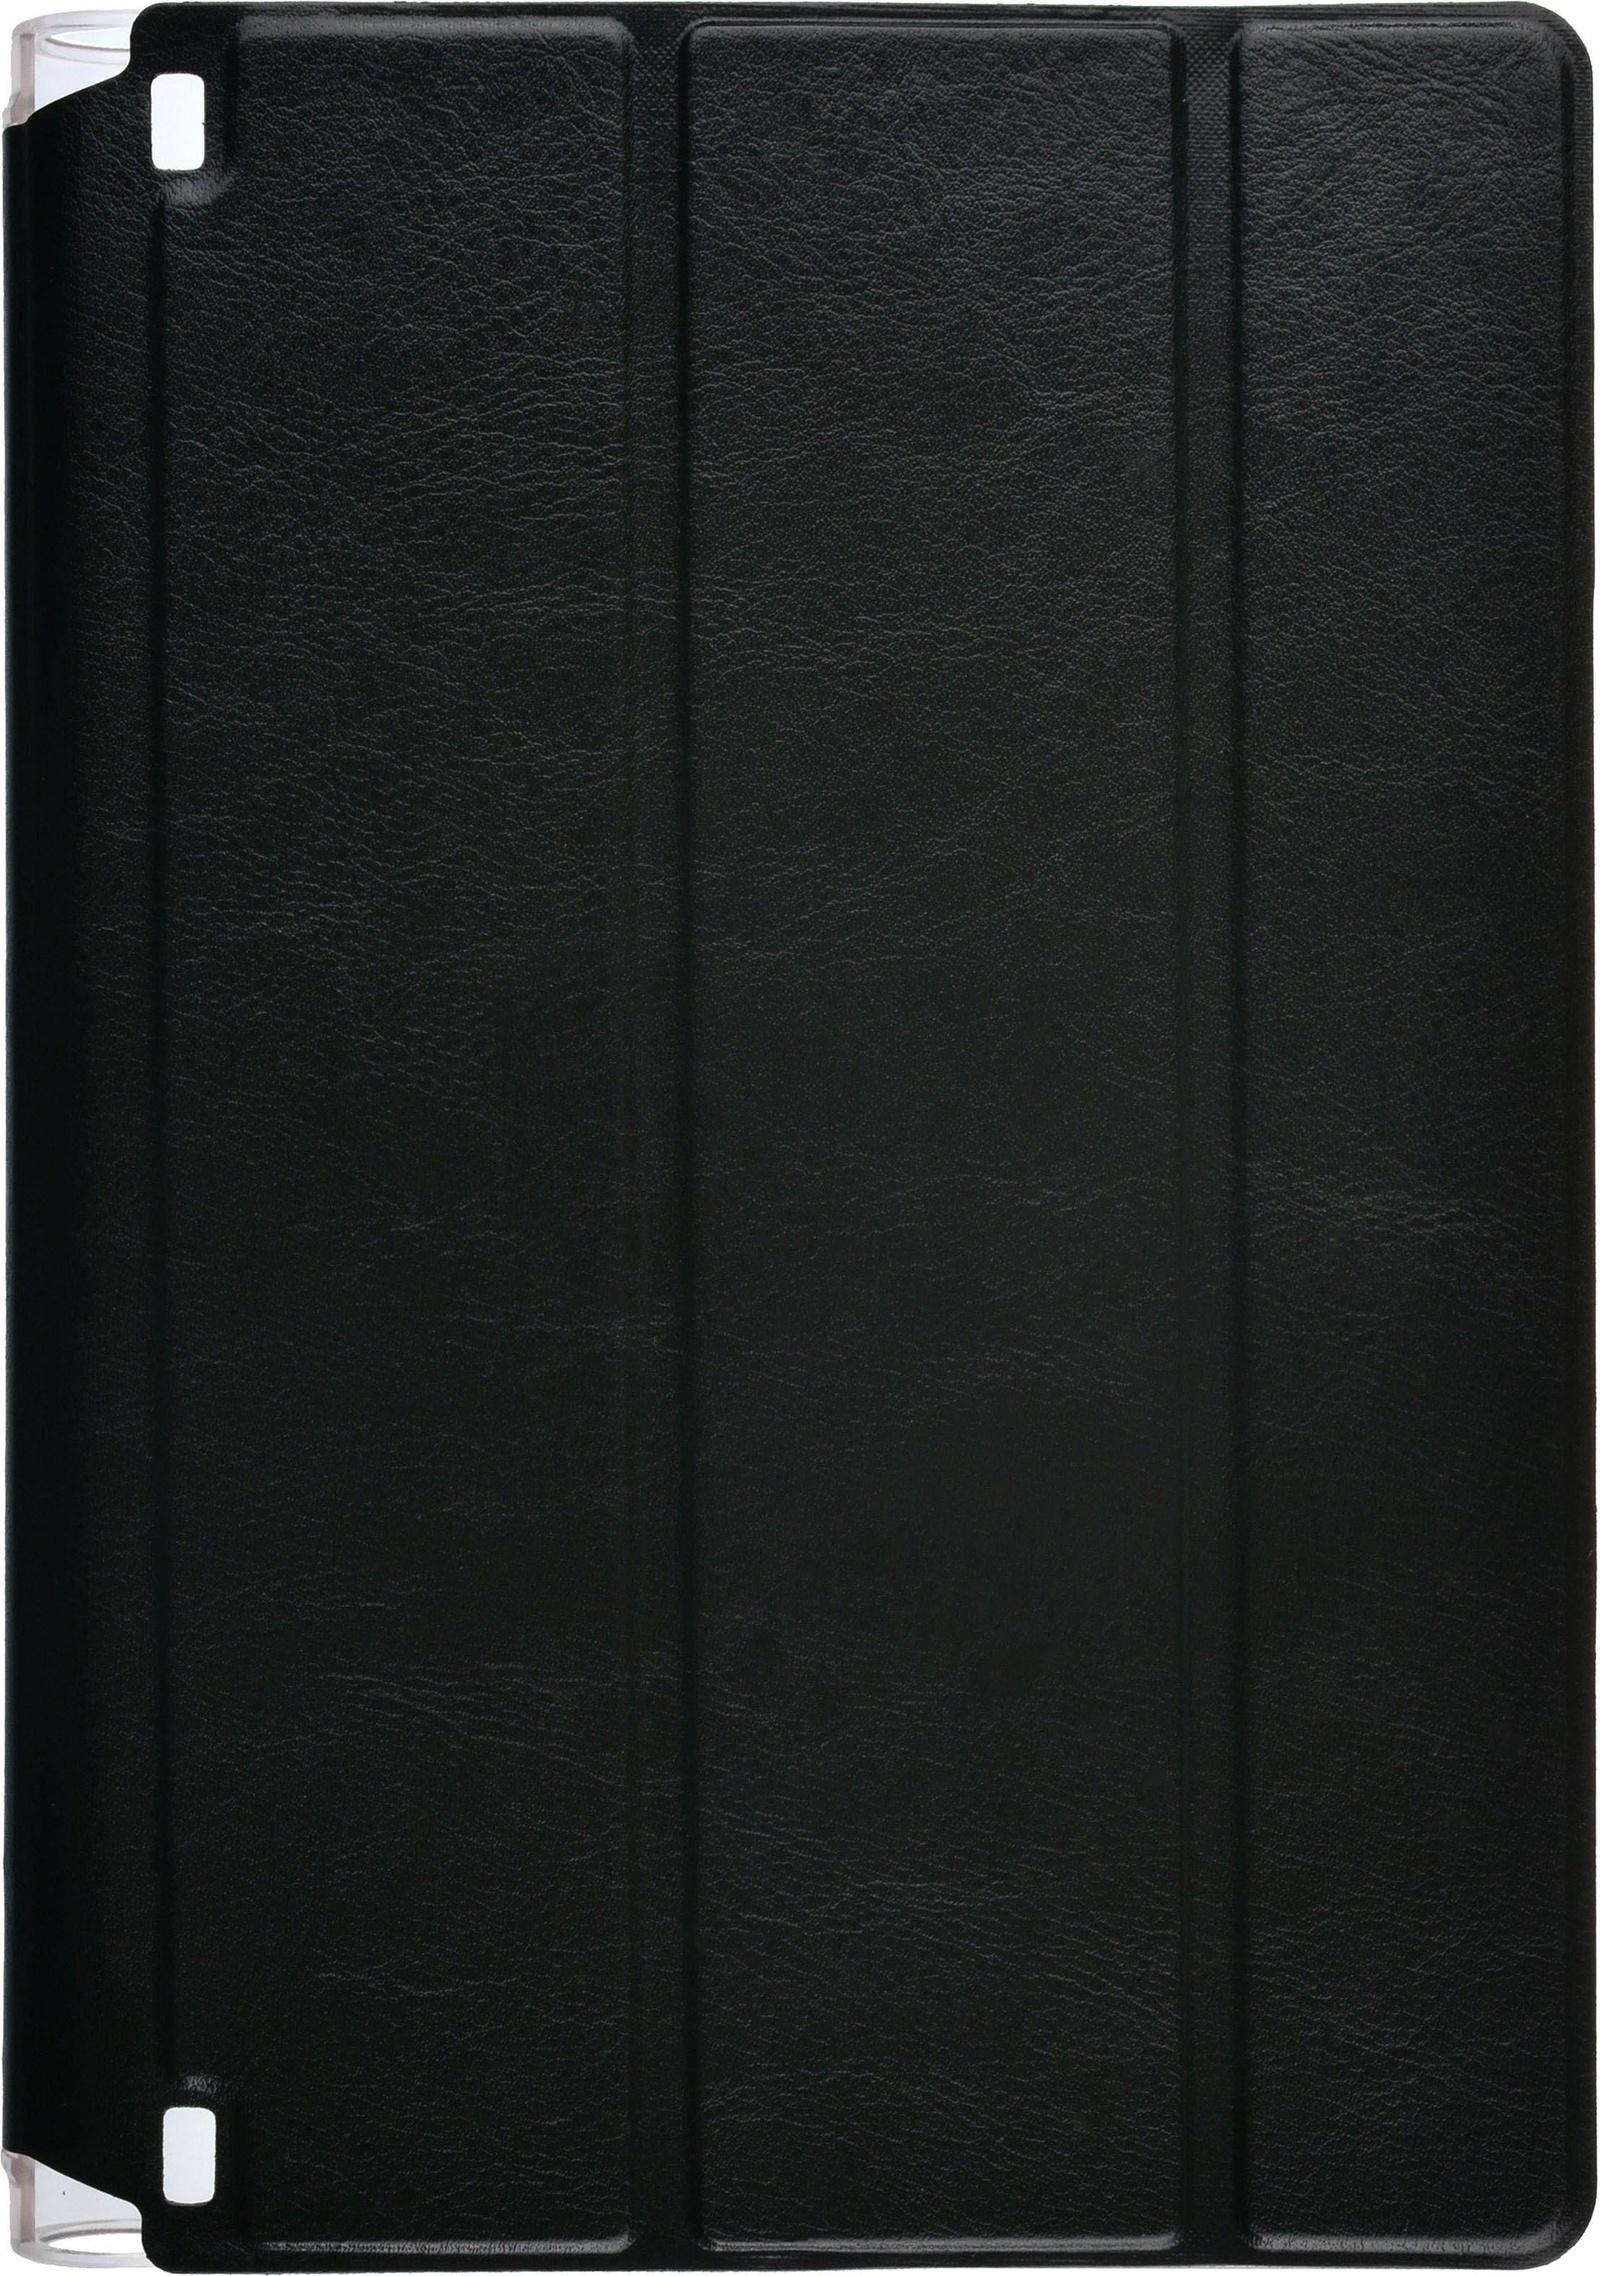 "Чехол ProShield для Lenovo Yoga Tablet 3 8"", 2000000086705, черный"